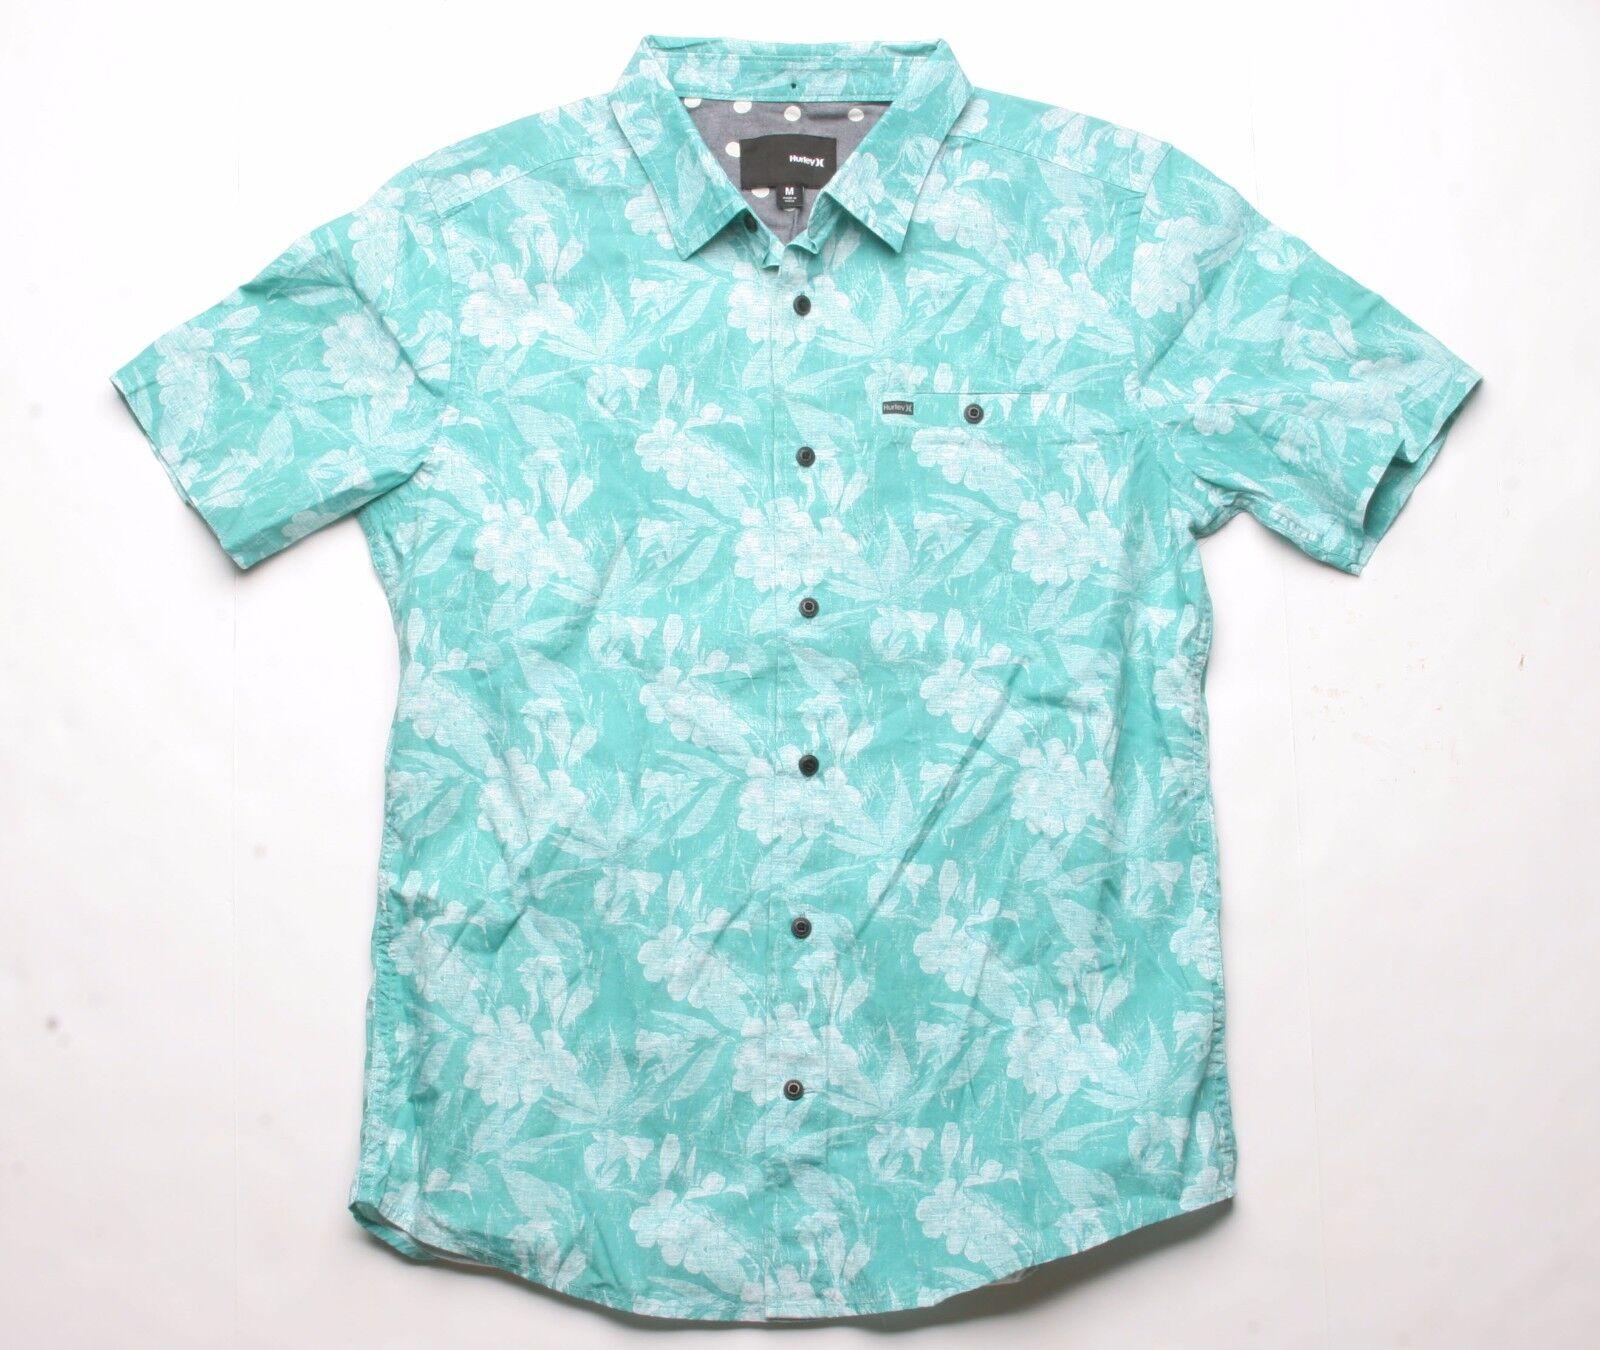 Hurley Belise Woven Shirt (Green) M